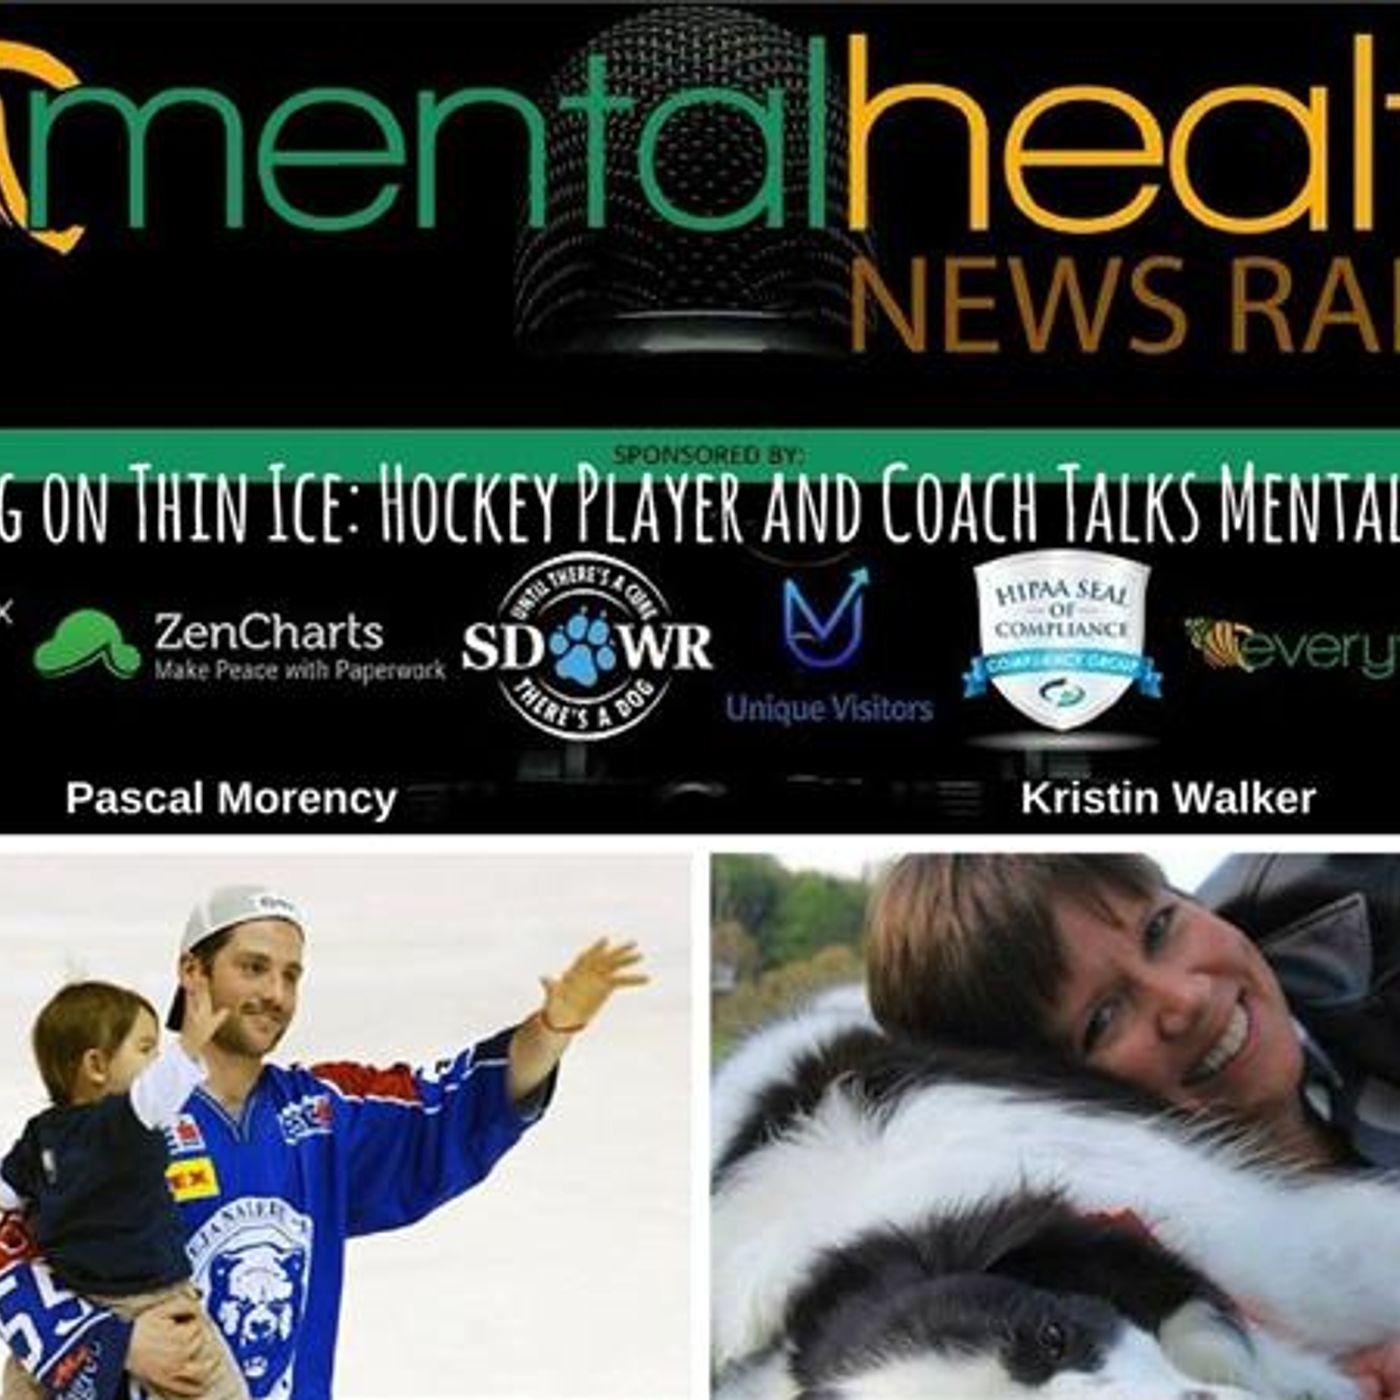 Mental Health News Radio - Skating on Thin Ice: Hockey Player and Coach Pascal Morency Talks Mental Health